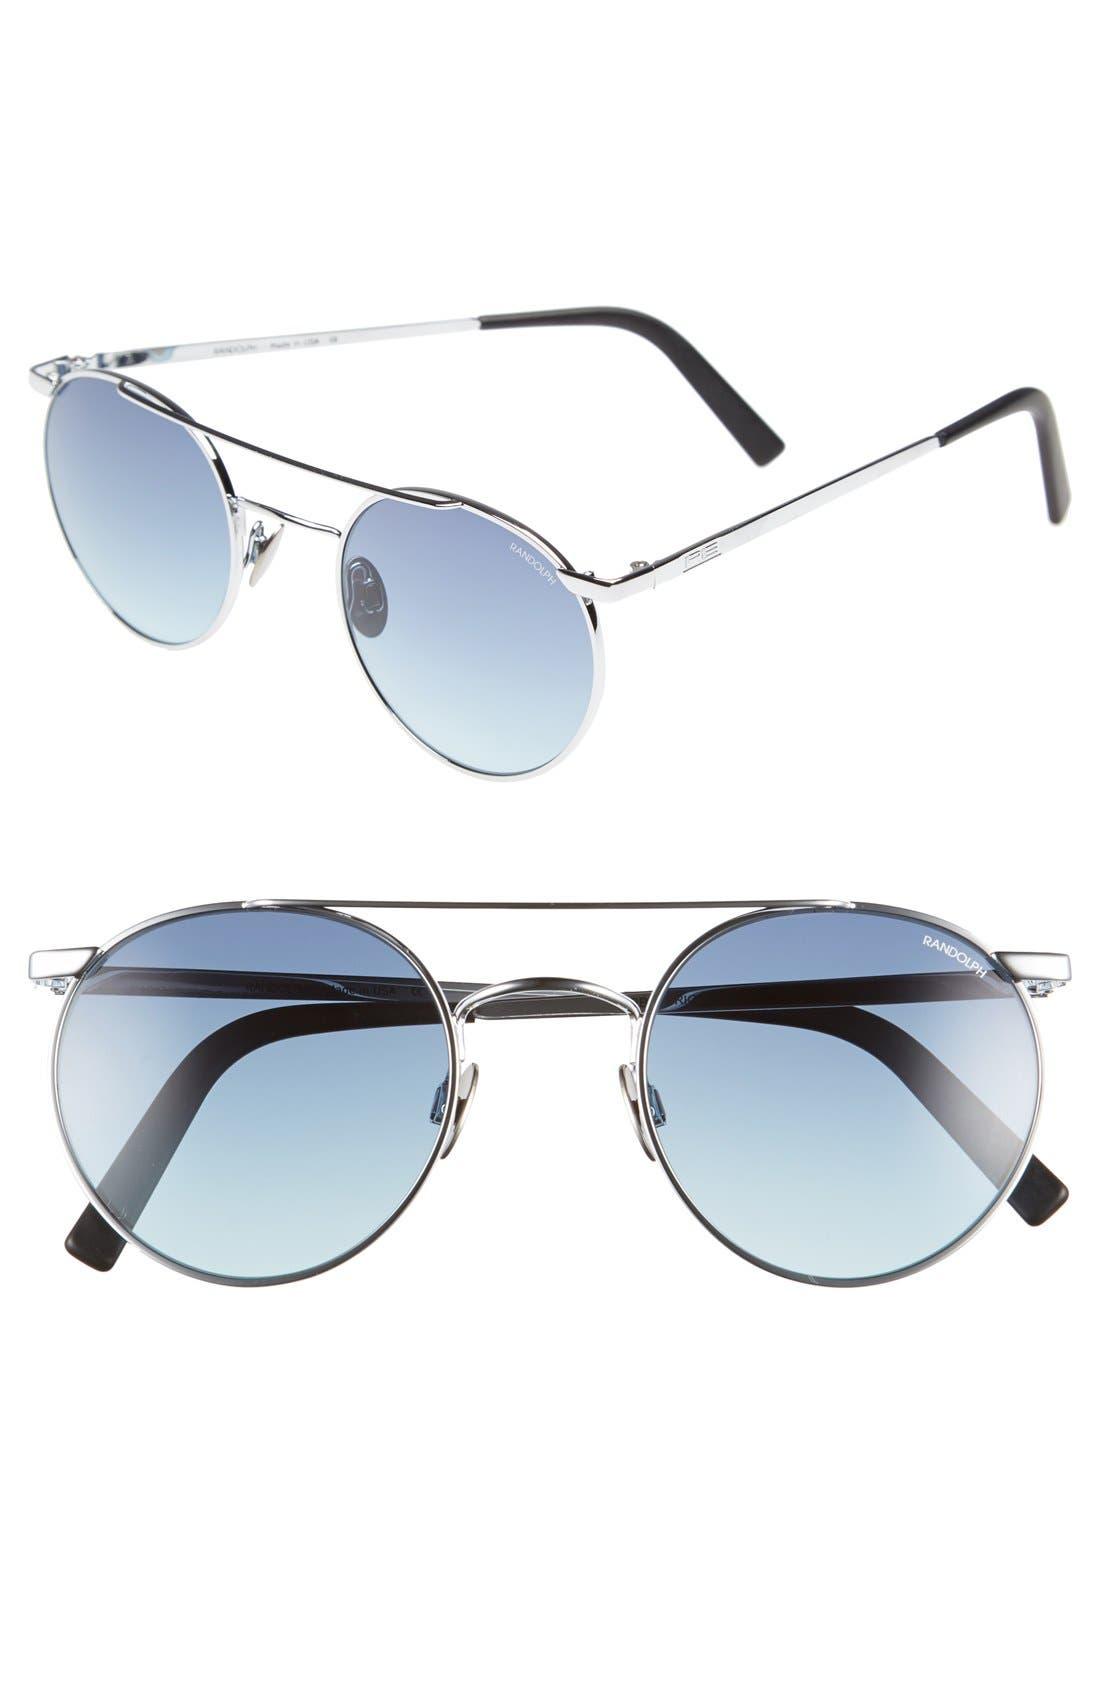 Randolph Engineering 'Shadow' Retro Sunglasses